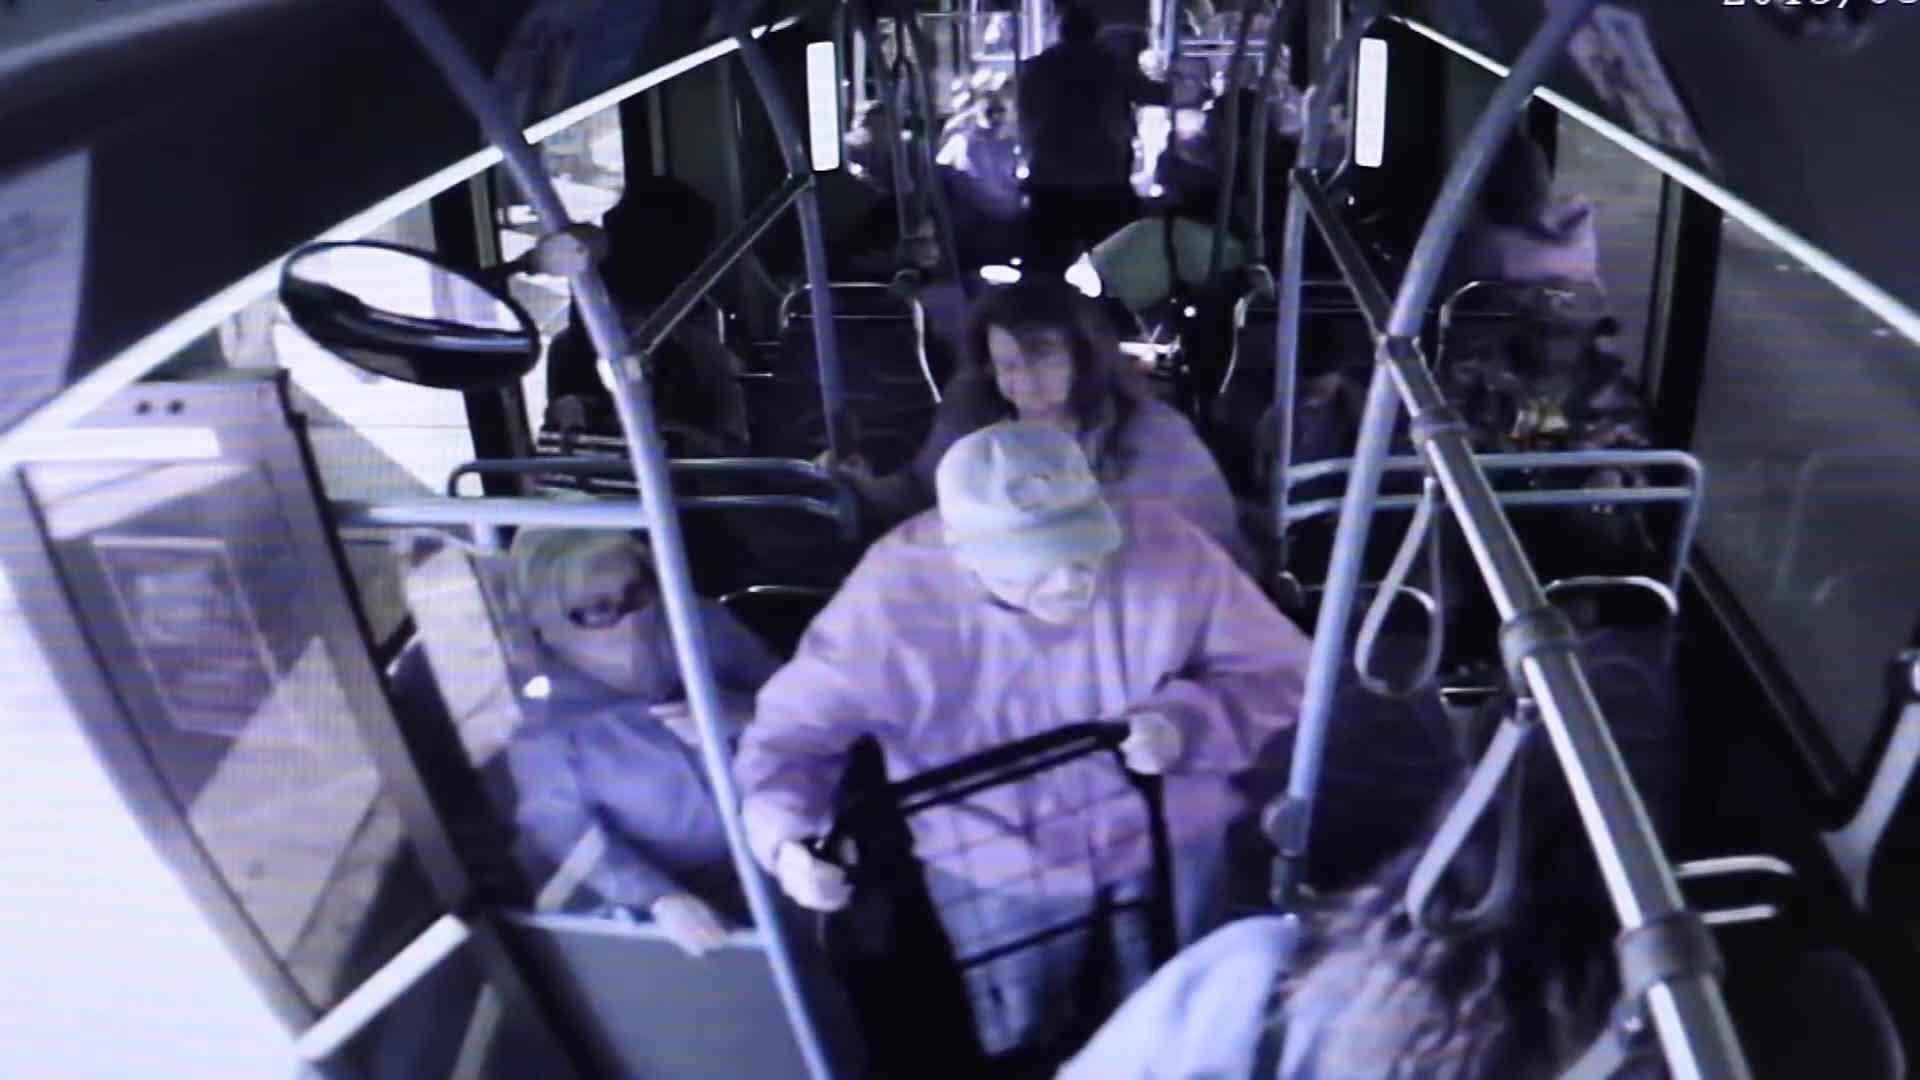 Elderly Man Dies After Pushed Off Bus (Disturbing)